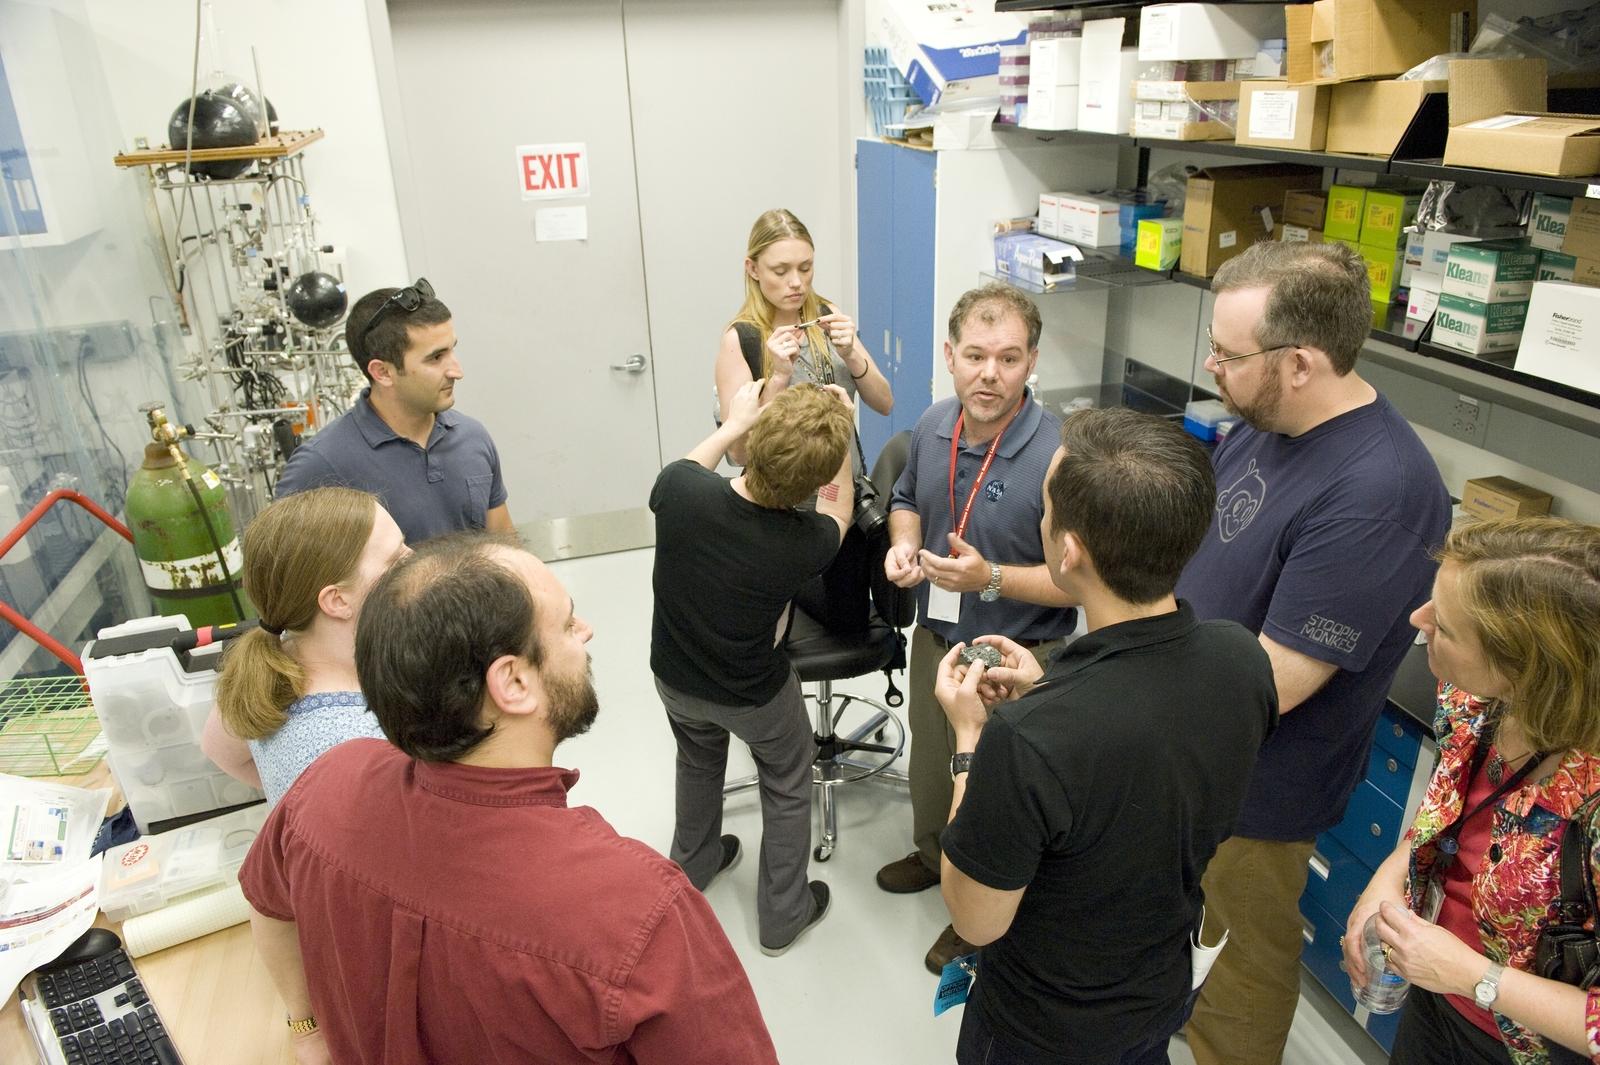 Hollywood actors Seth Green and Clare Grant visit NASA Goddard Space Flight Center